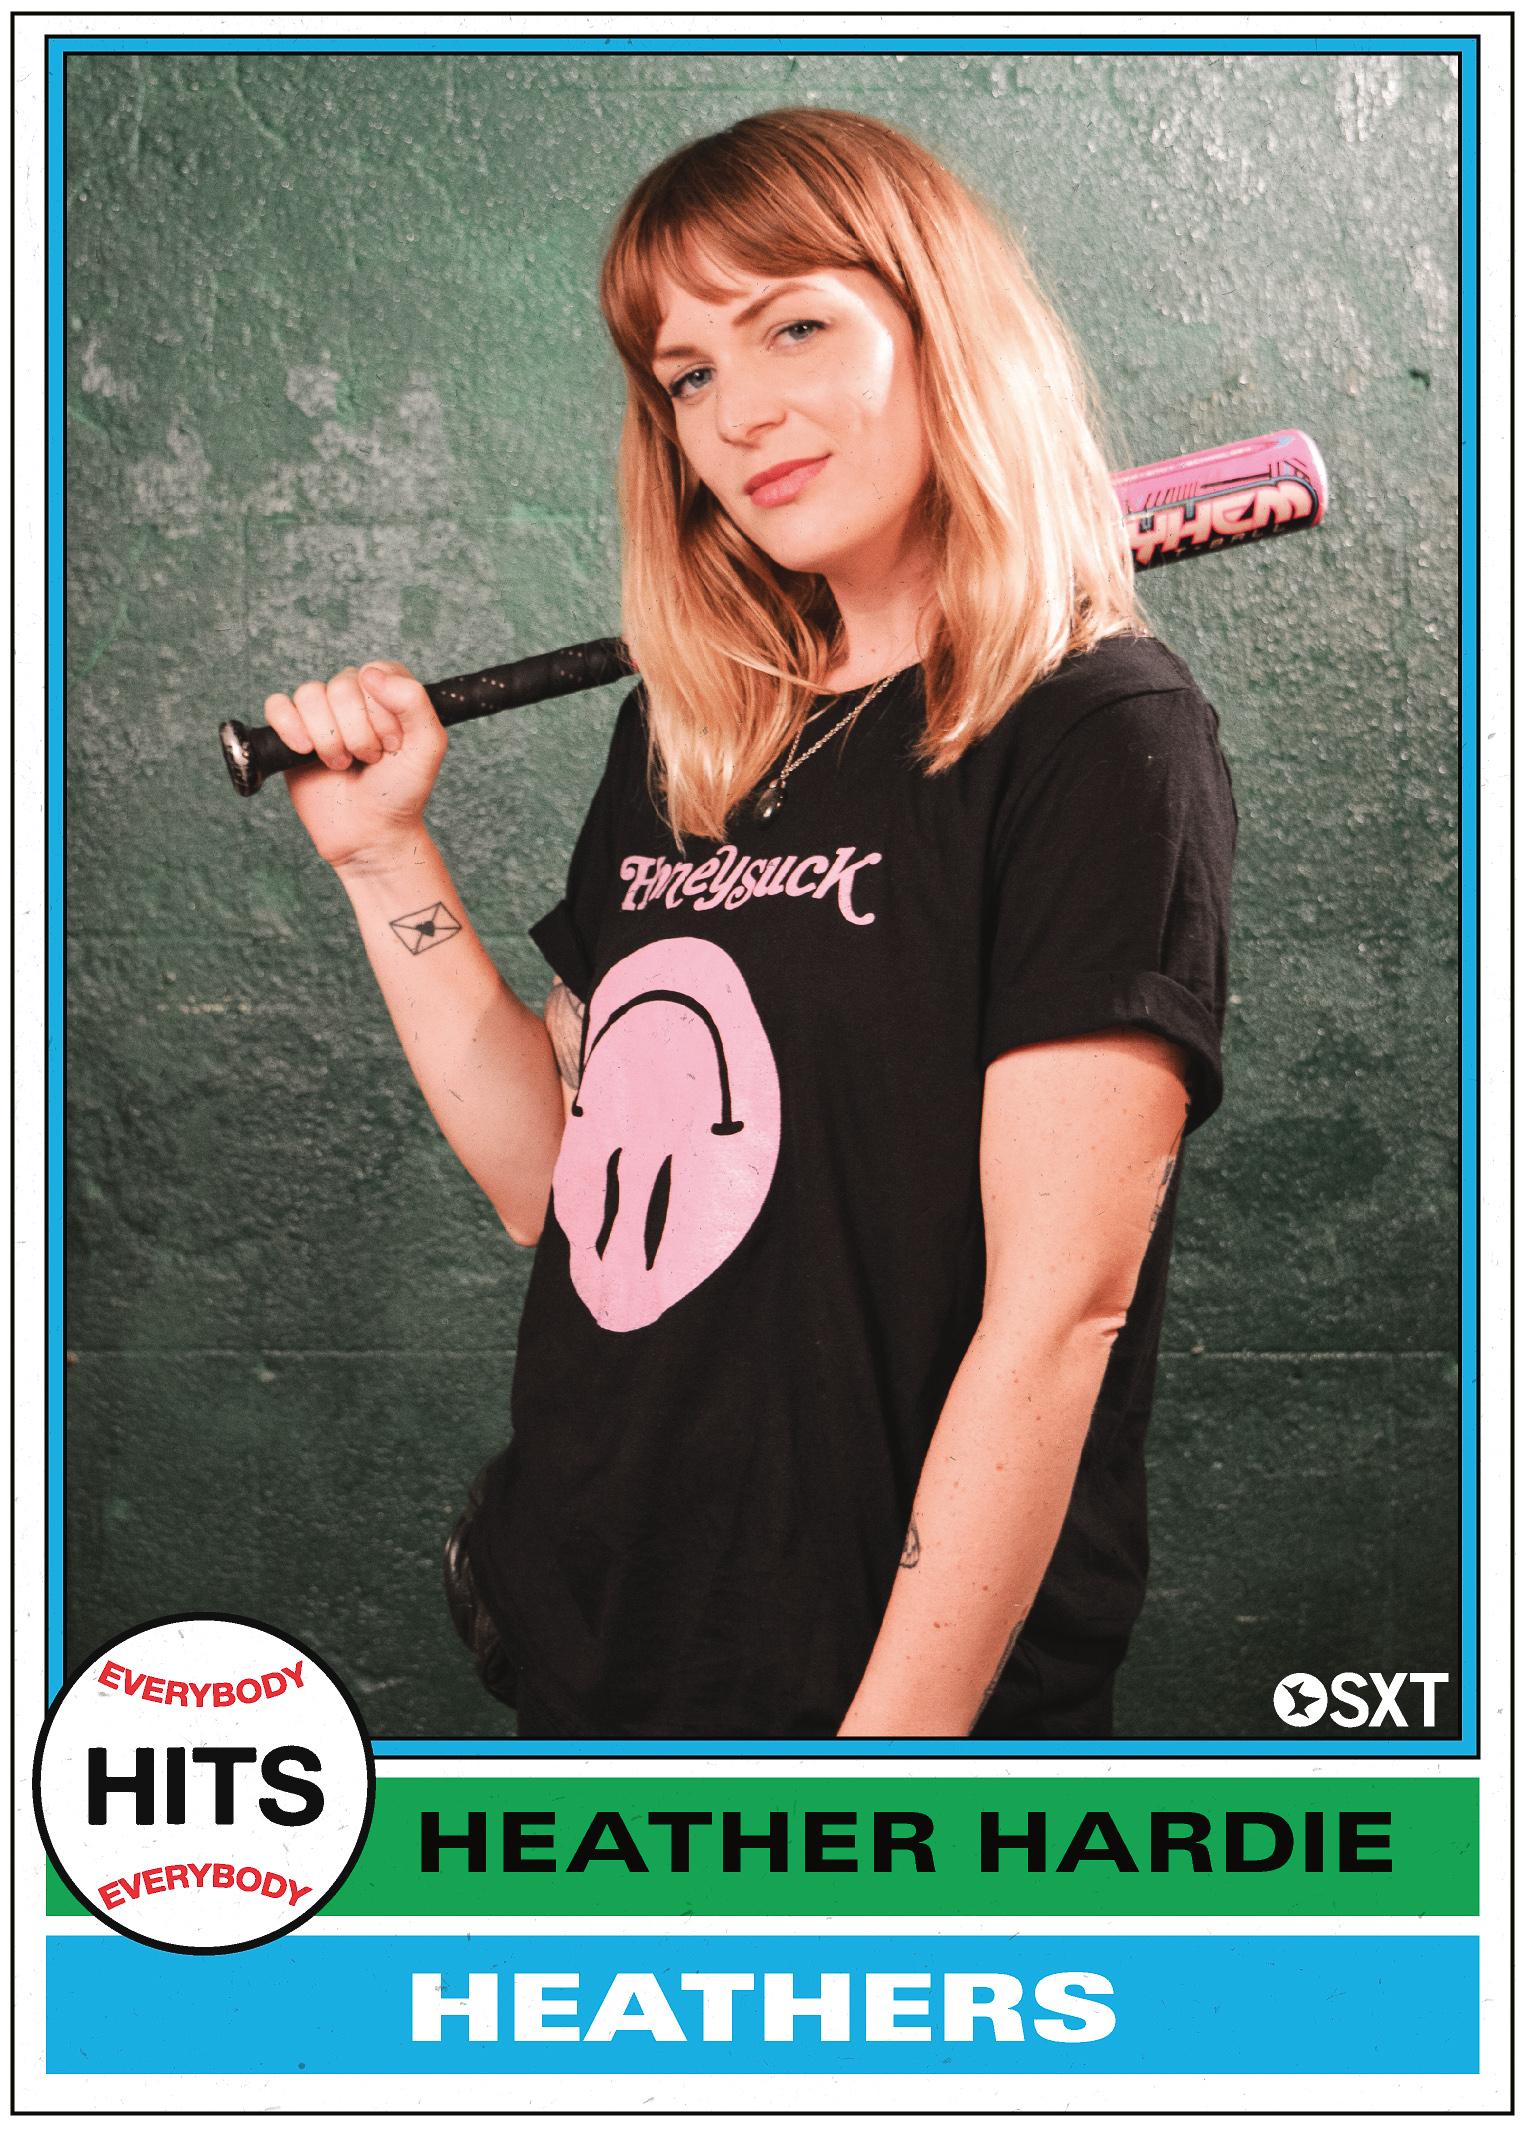 Heather Hardie of Heathers